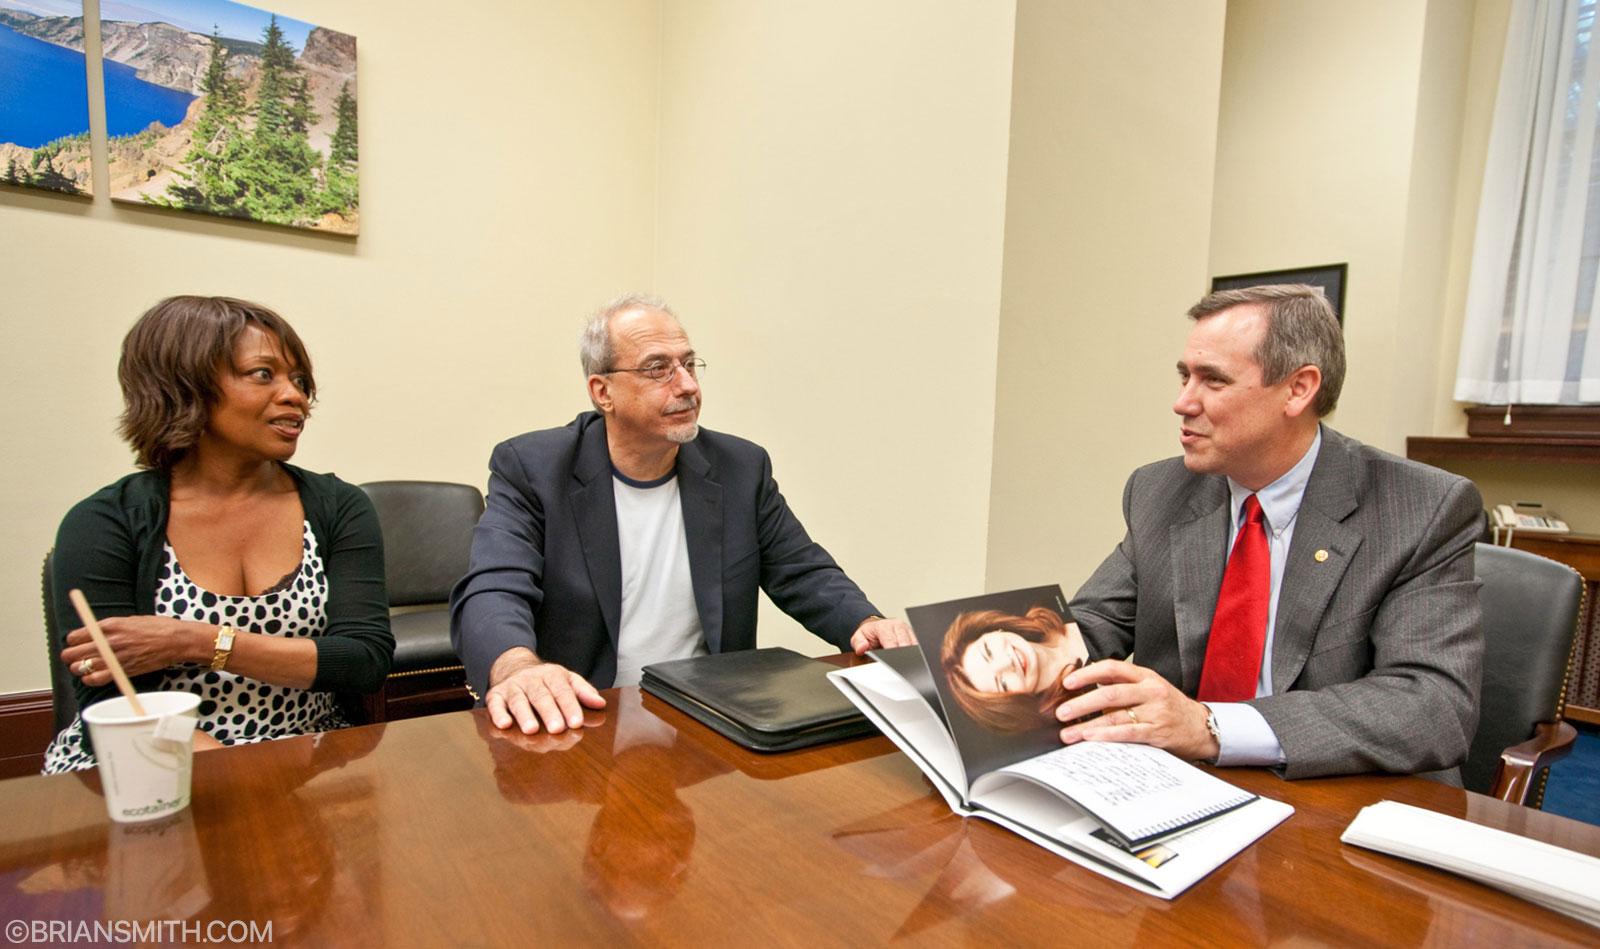 Alfre Woodard & Tom Fontana of The Creative Coalition meet with Senator Jeff Merkley